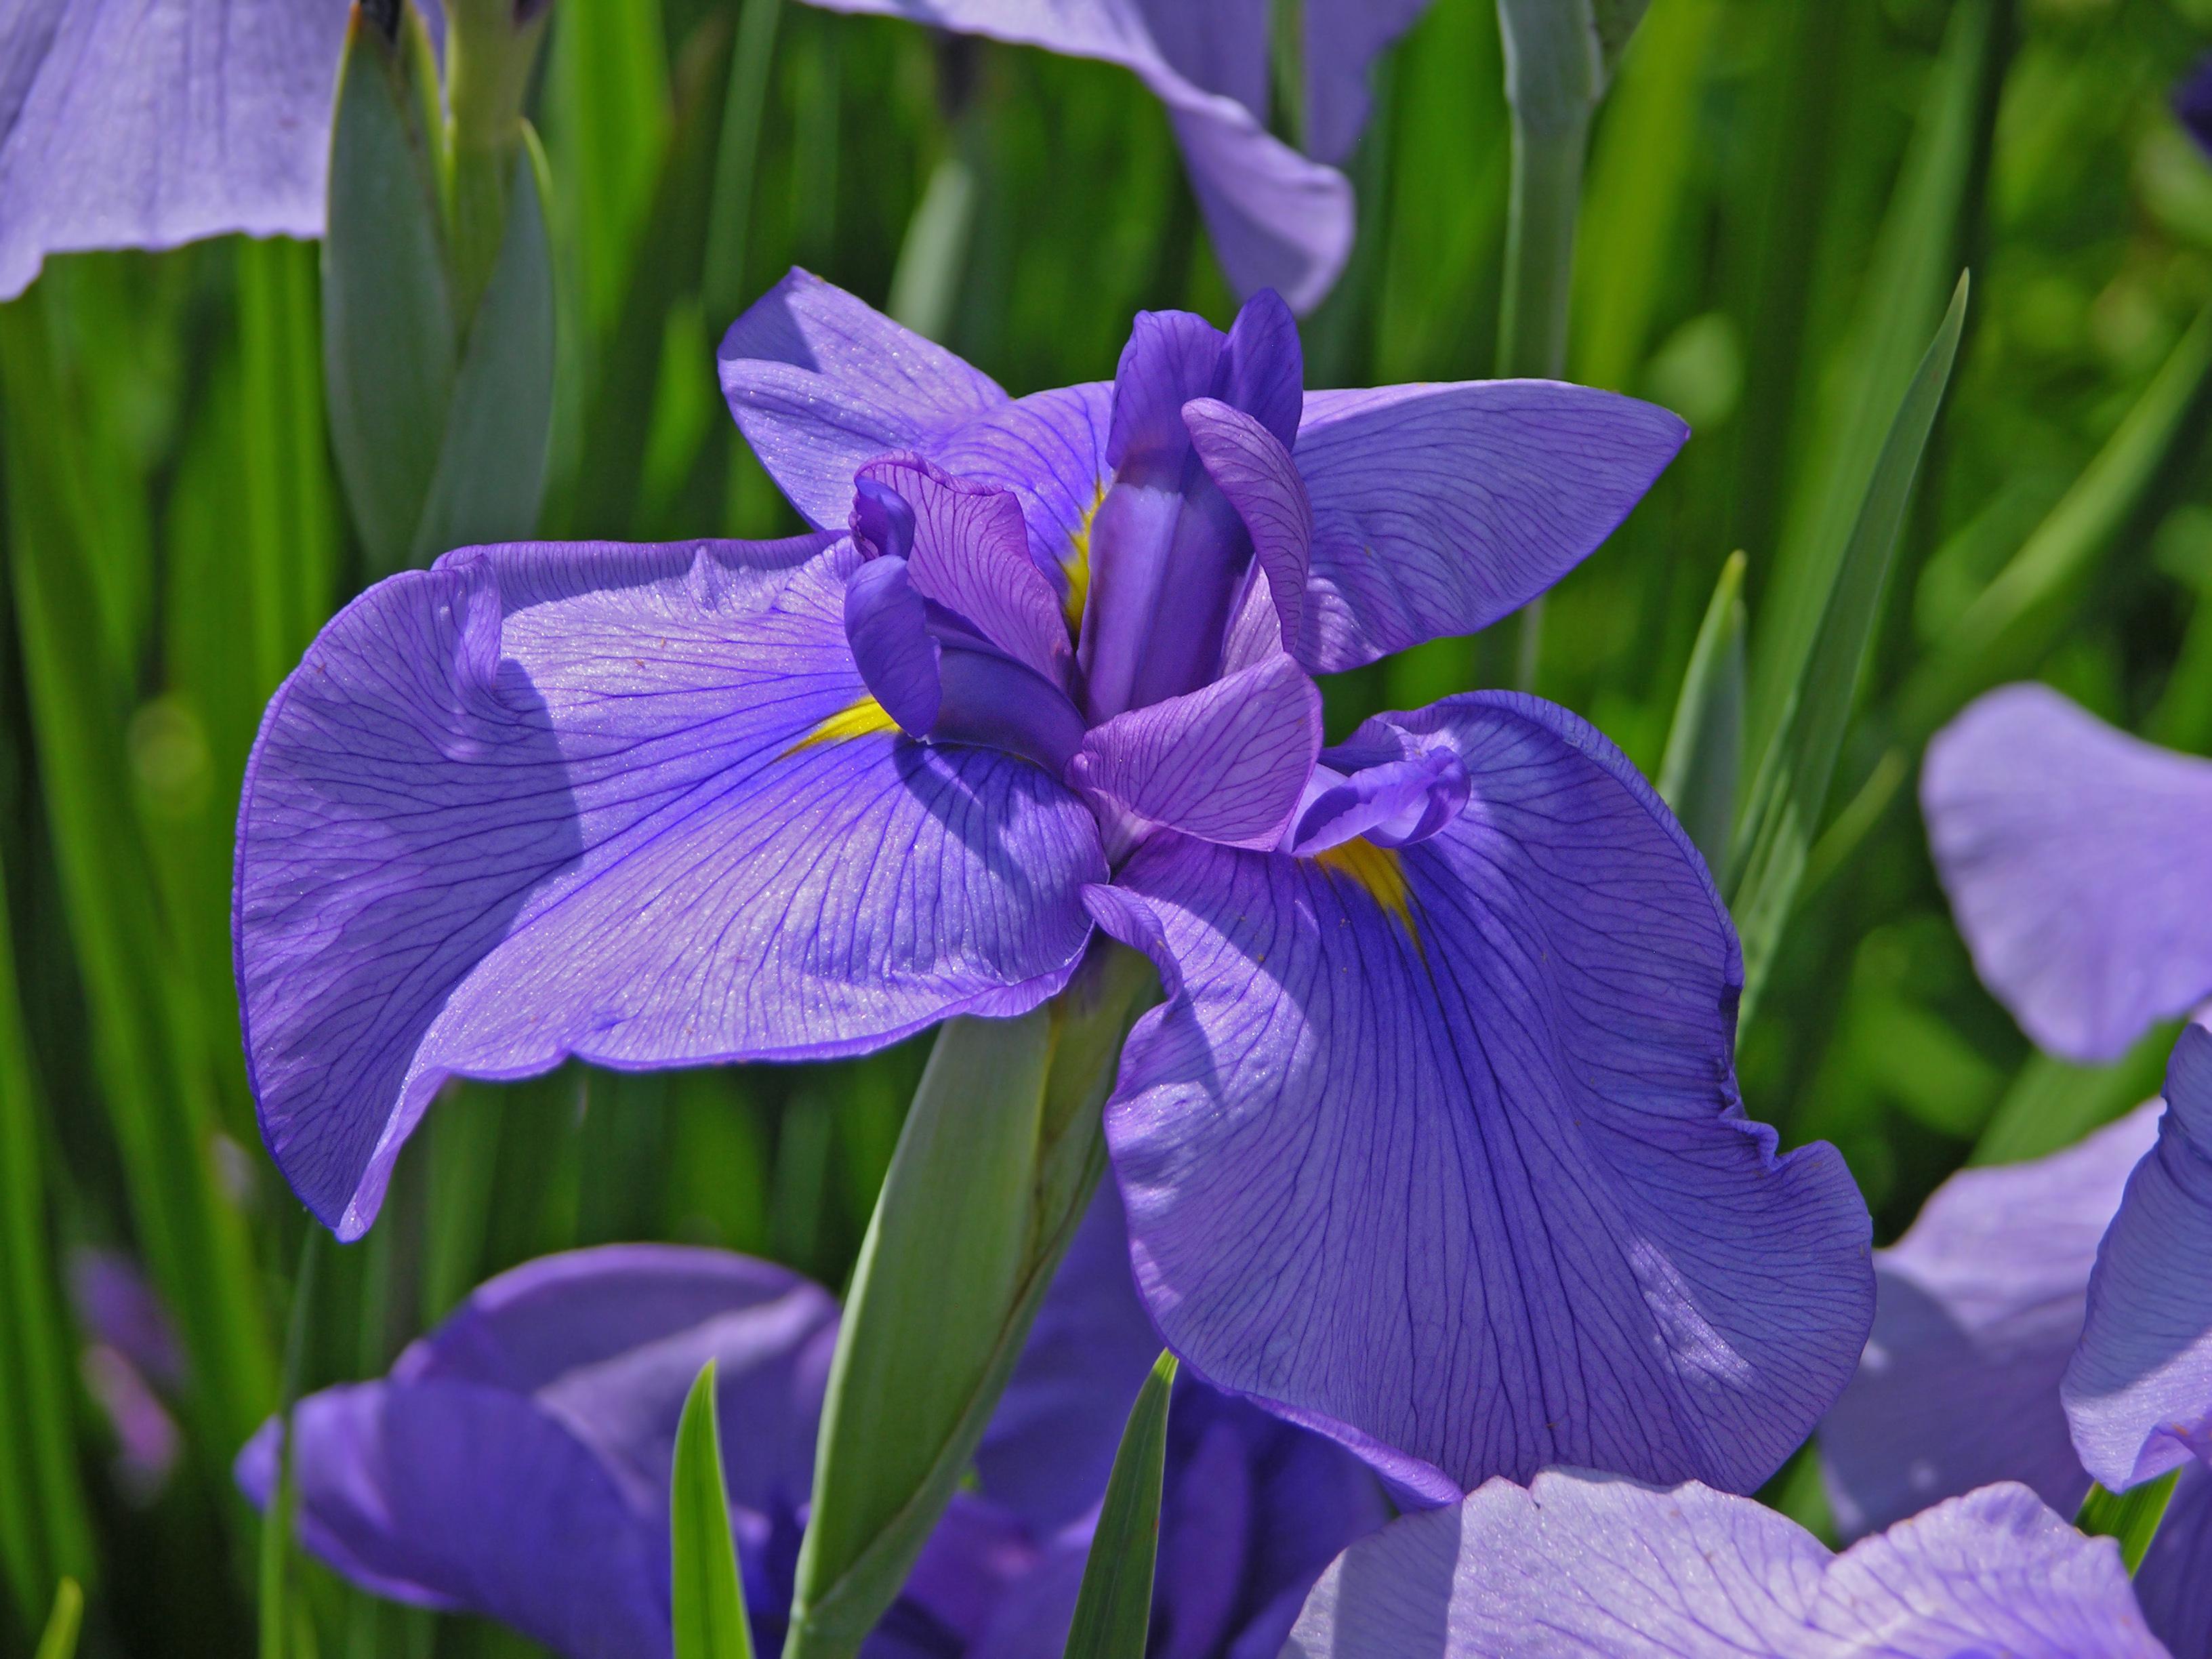 Iris l httpuploadmediawikipediacommons00funidentifiedirischanticleerblue3264pxg izmirmasajfo